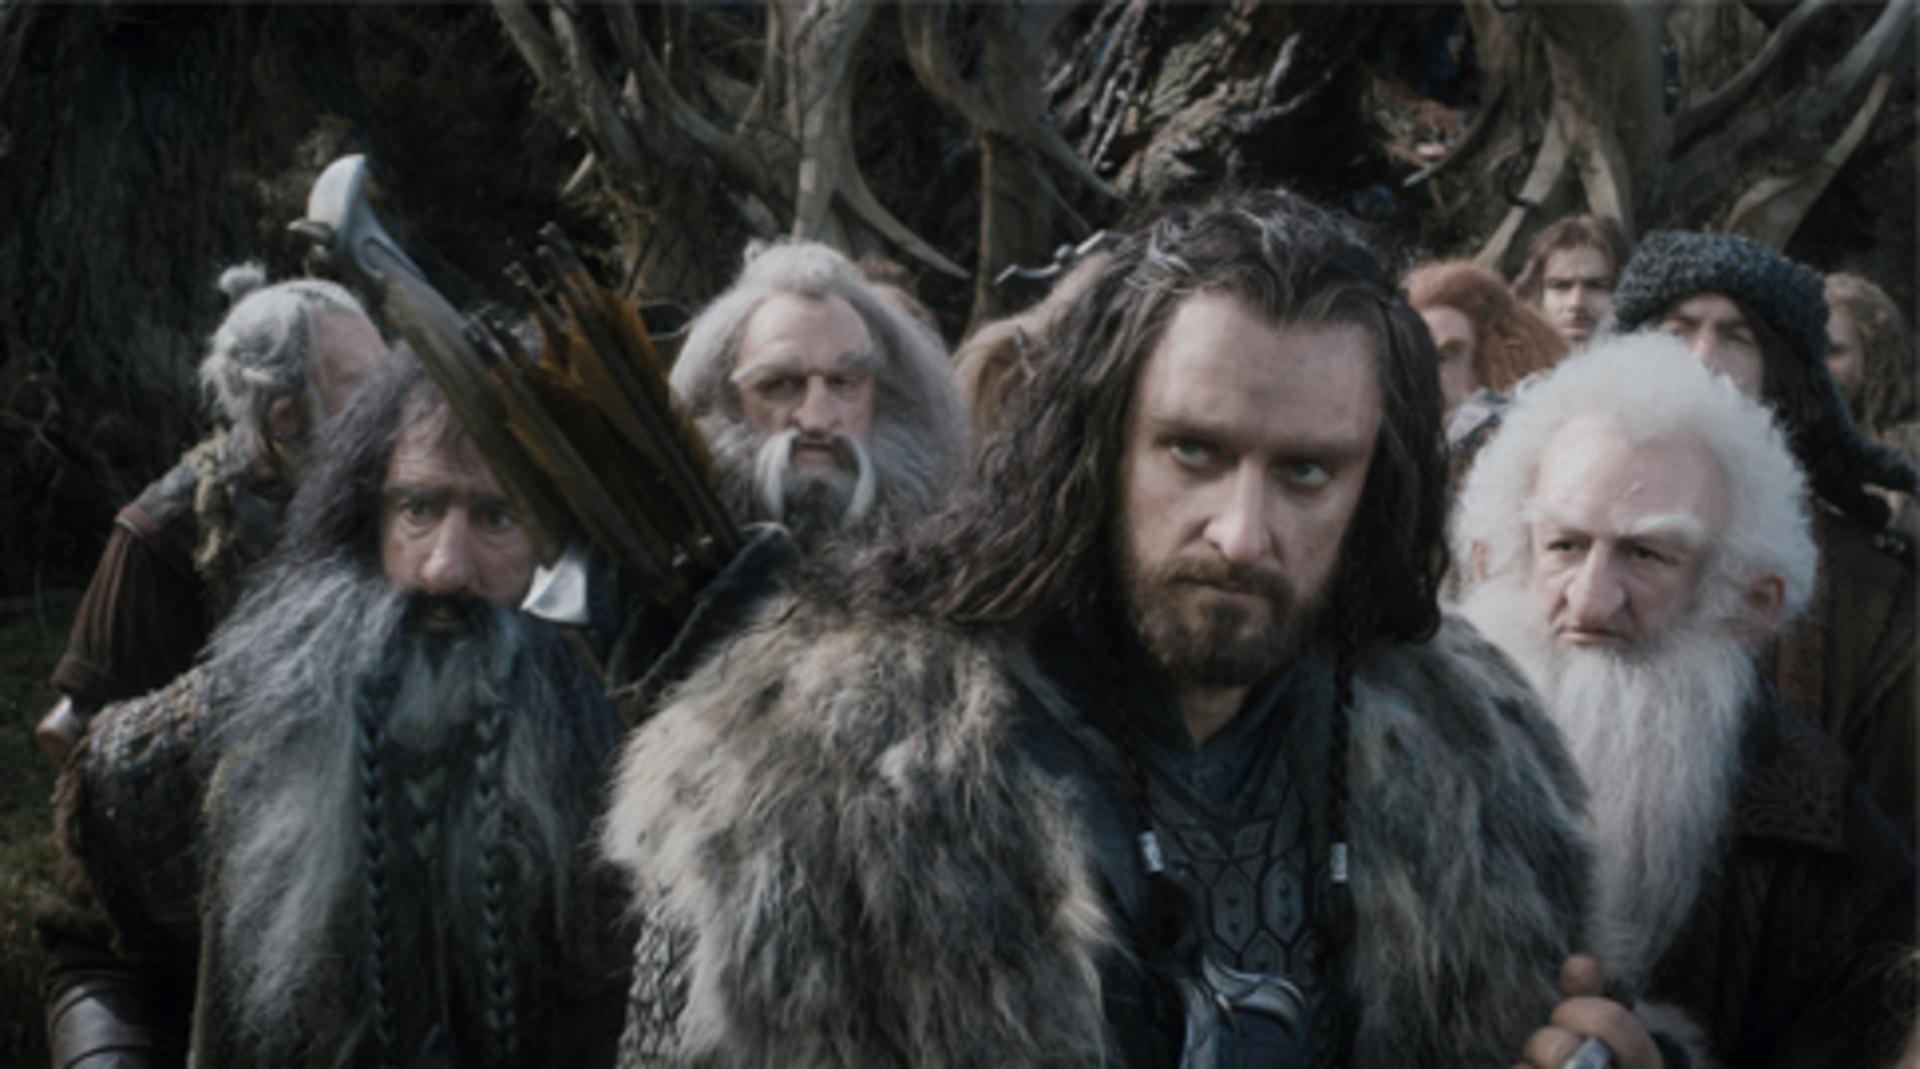 The Hobbit: The Desolation of Smaug - Image 19